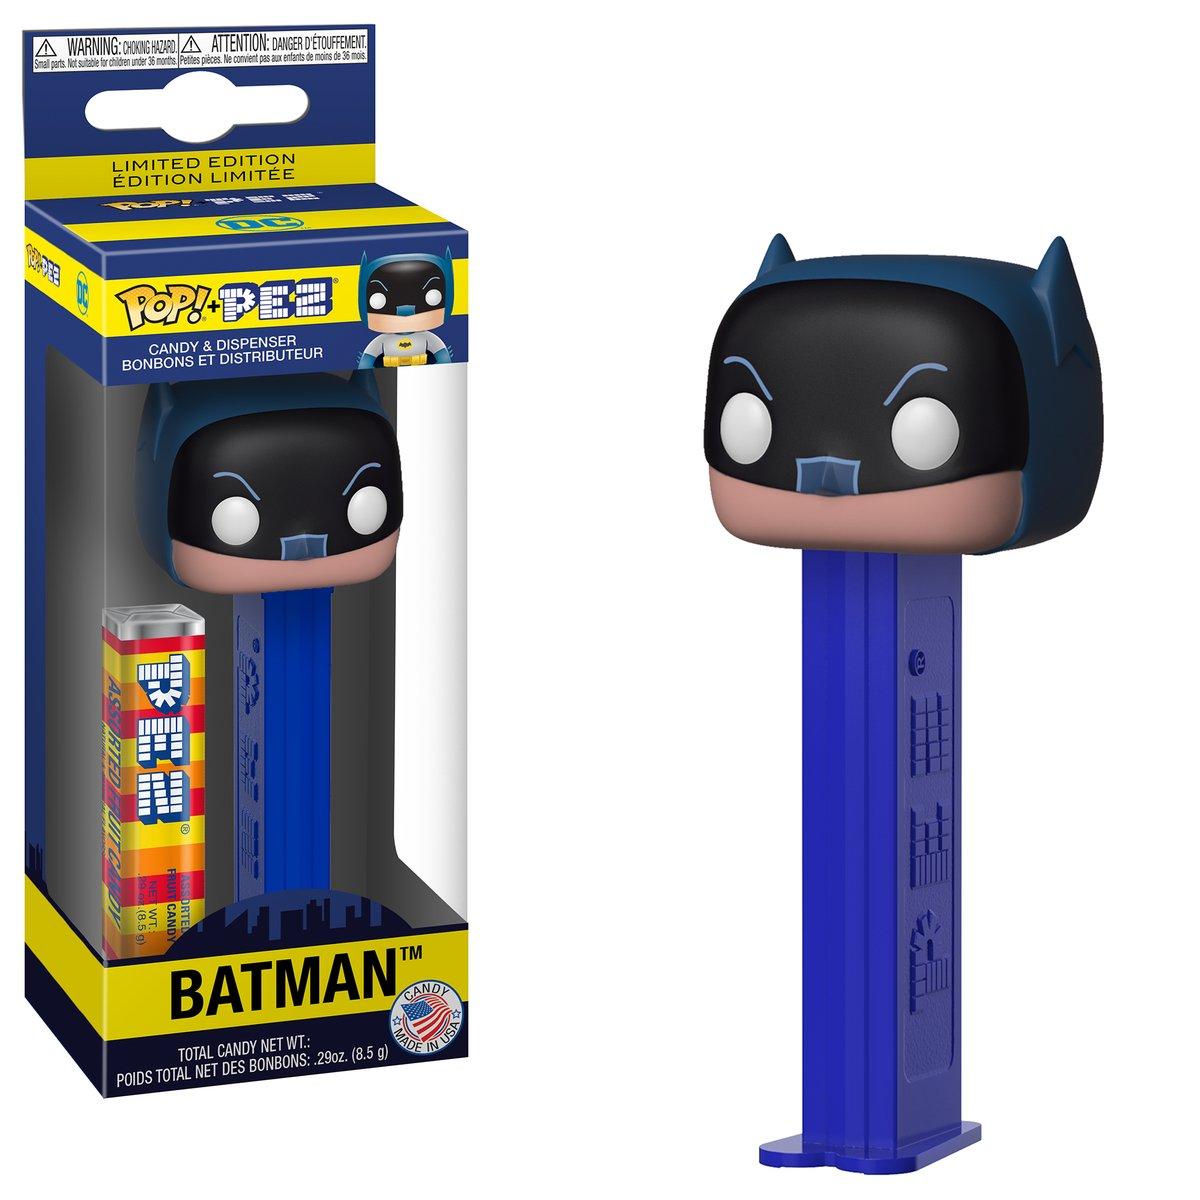 RT @OriginalFunko: RT & follow @OriginalFunko for the chance to win a Batman Pop! PEZ! https://t.co/NdHMHHCDMA